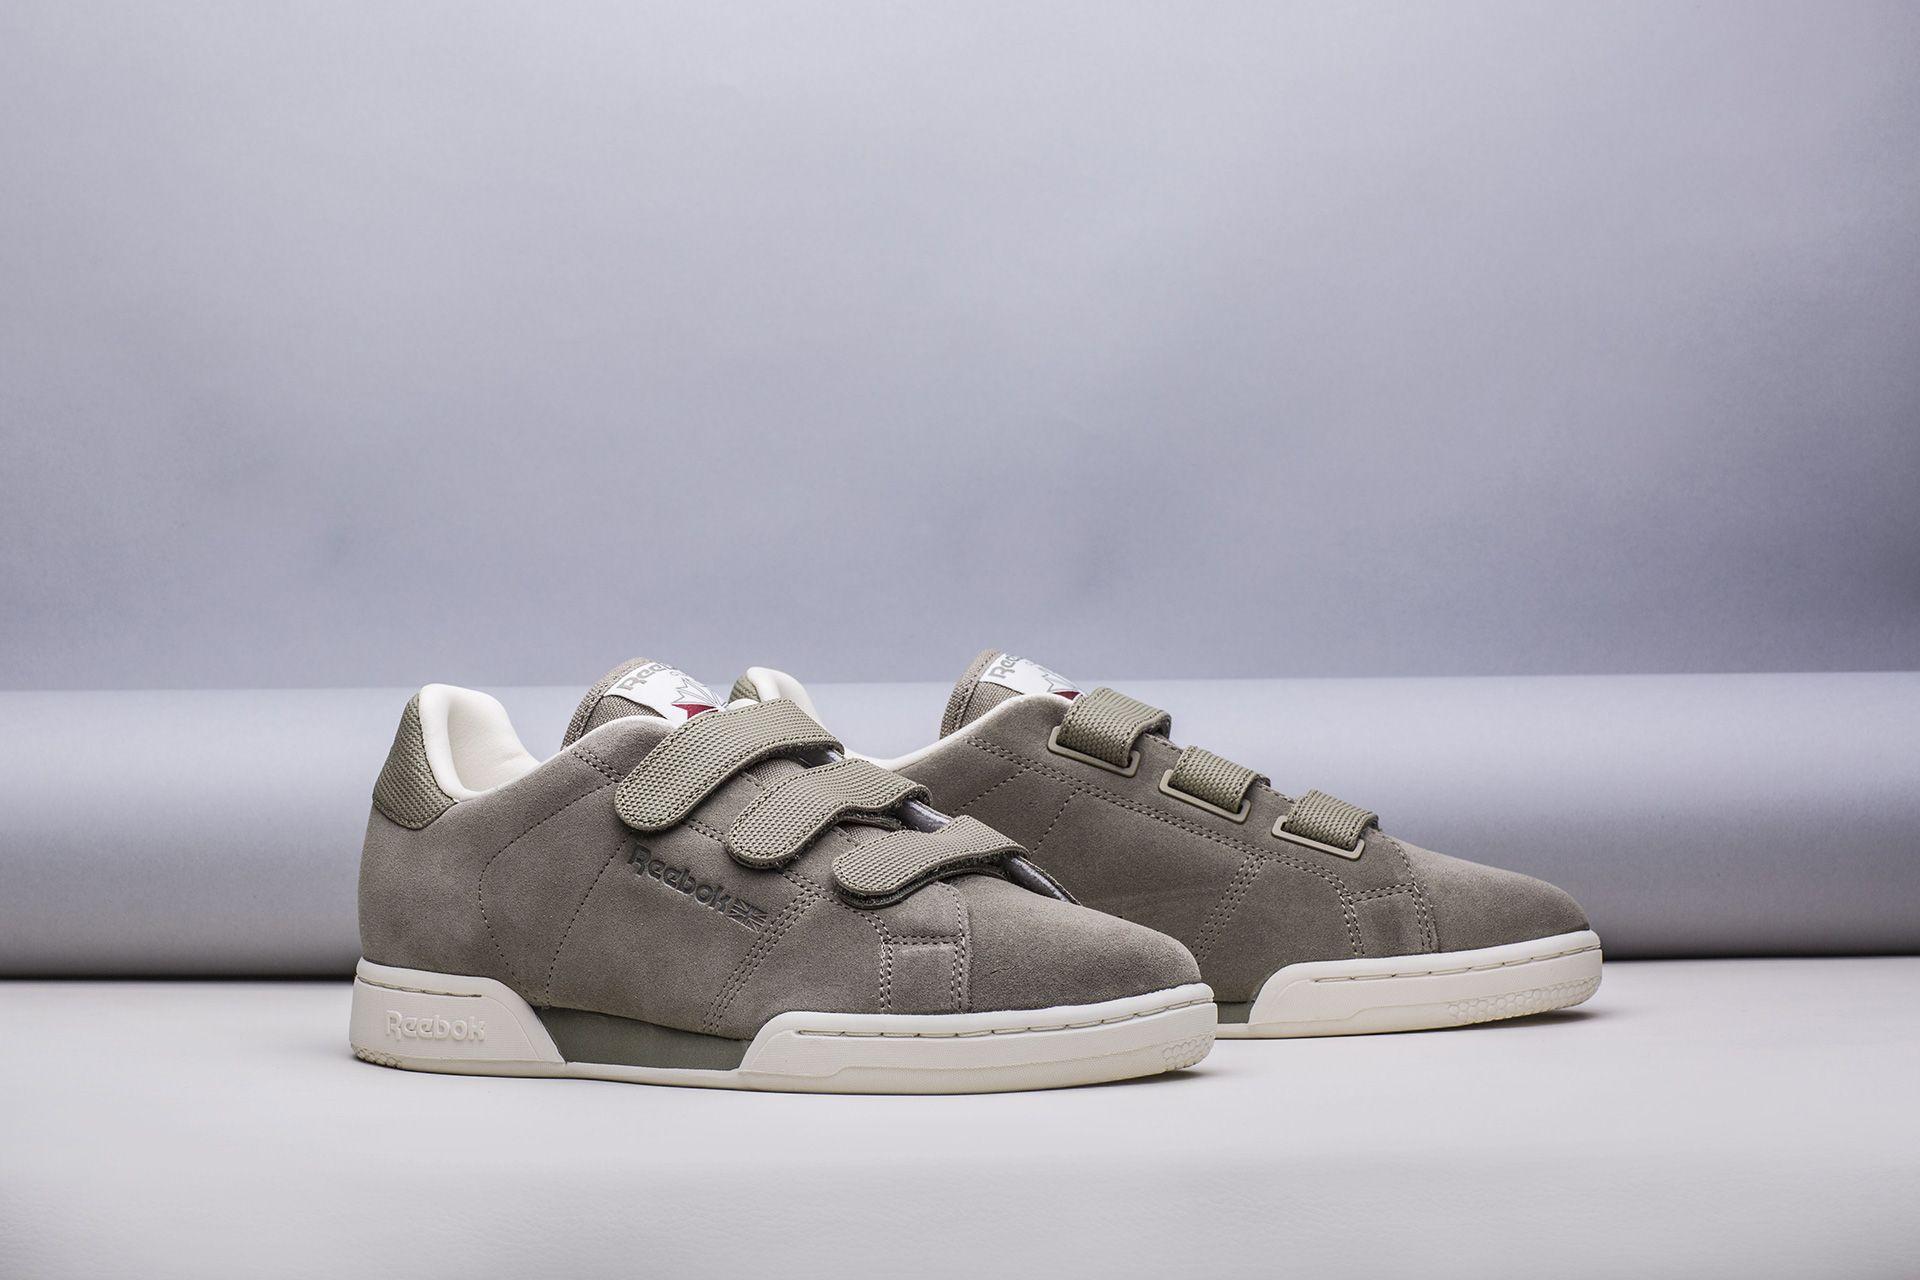 f6e160004c76 Купить хаые мужские кроссовки NPC Straps N от Reebok (BD2974) по ...